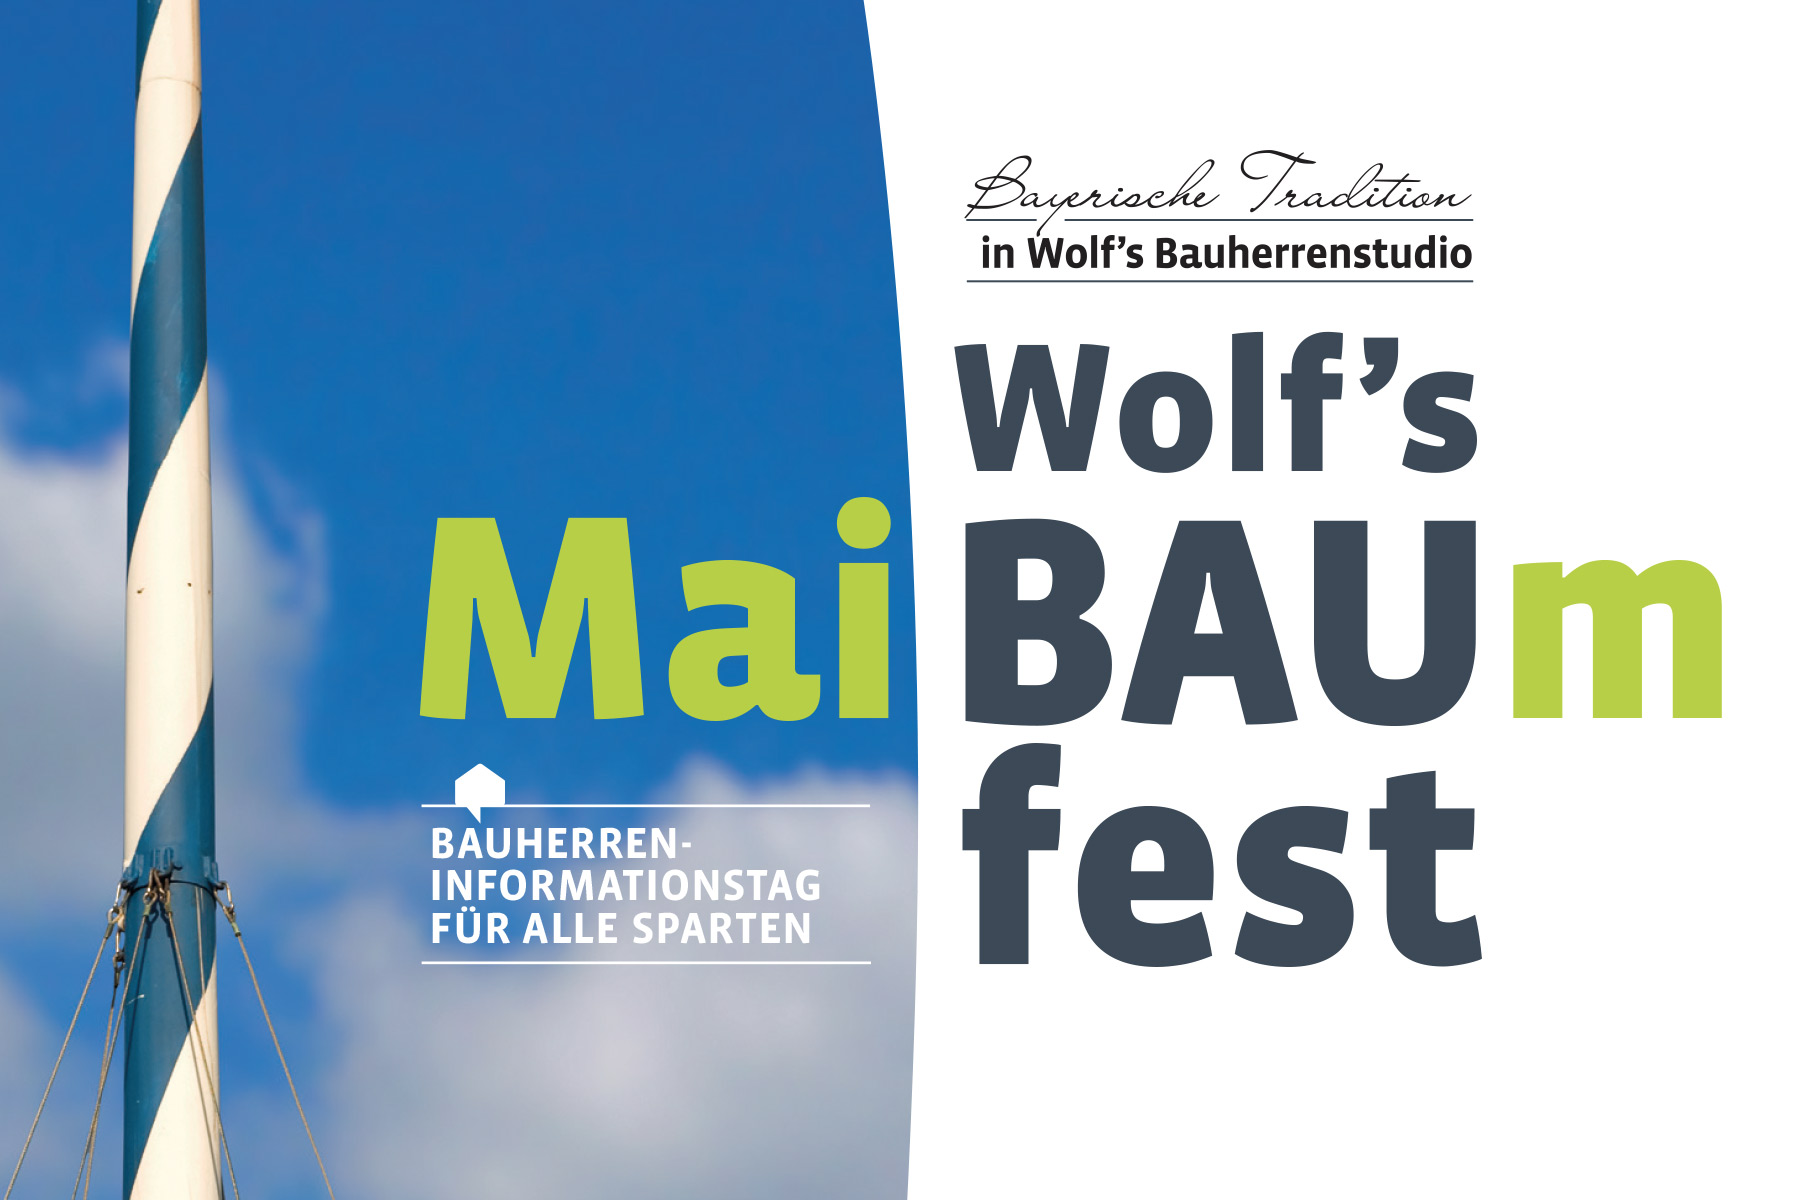 WOLF MaiBAUMfest